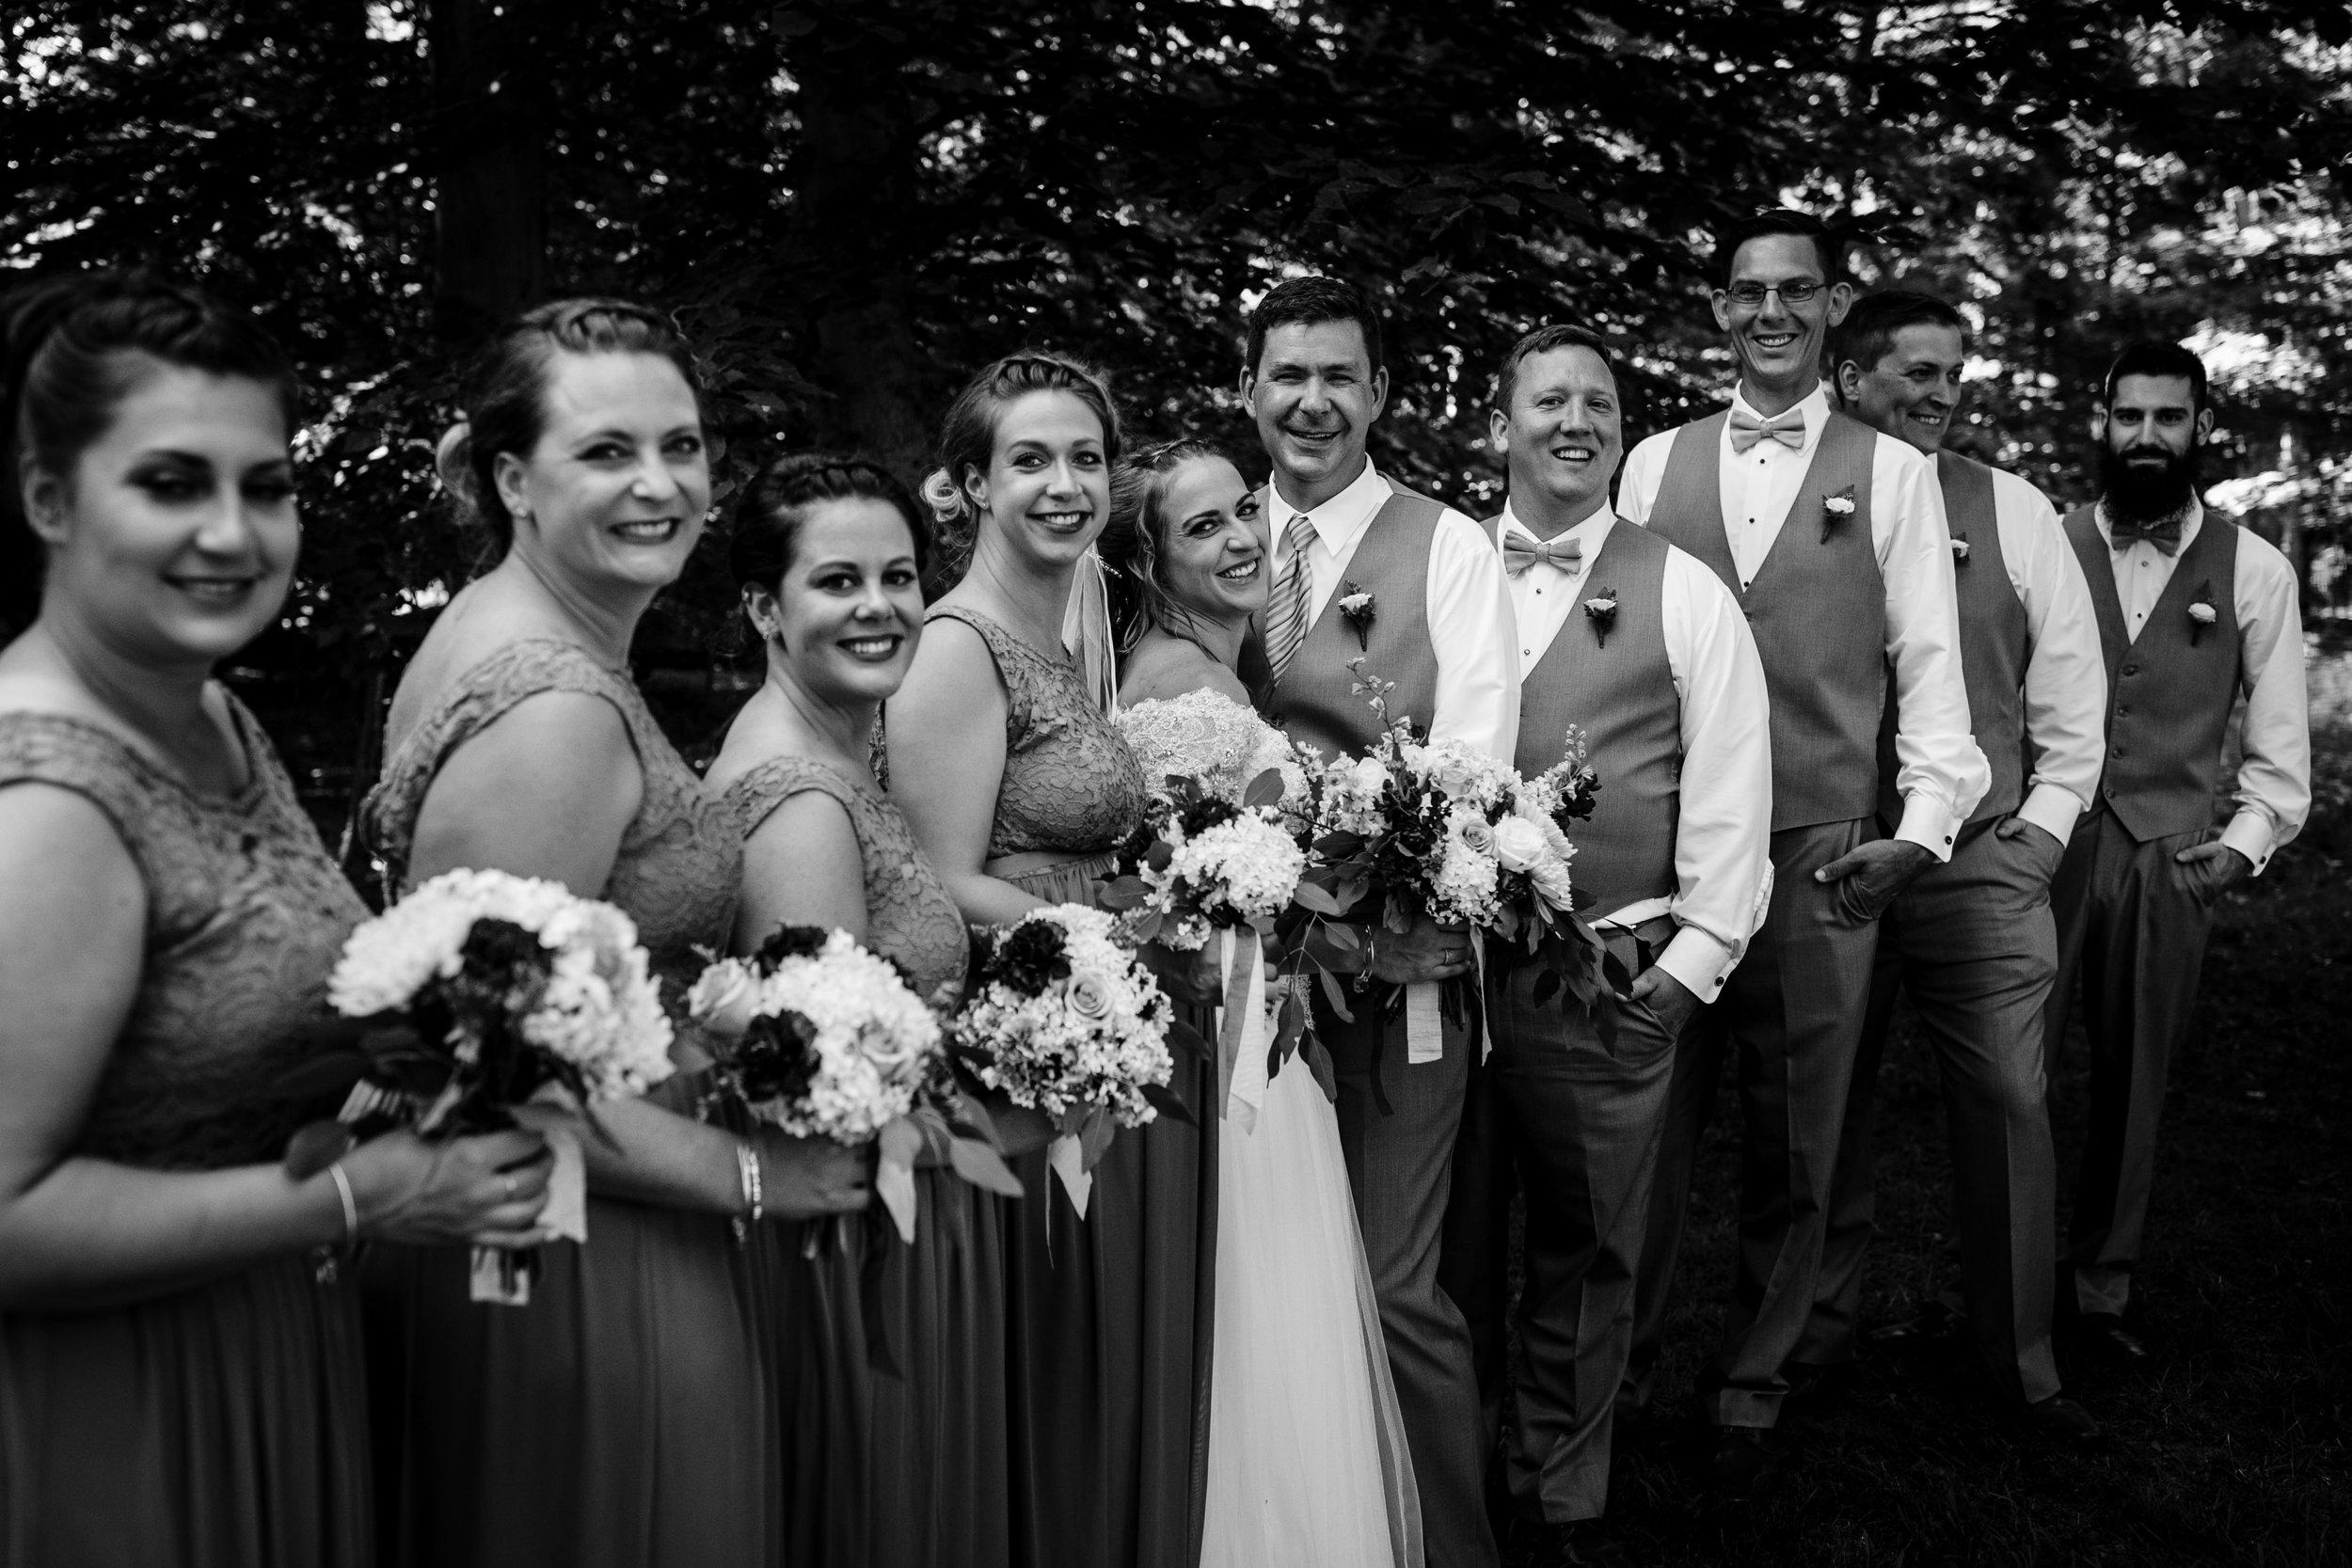 ludington-michigan-intimate-backyard-wedding-jessica-nolan154.jpg